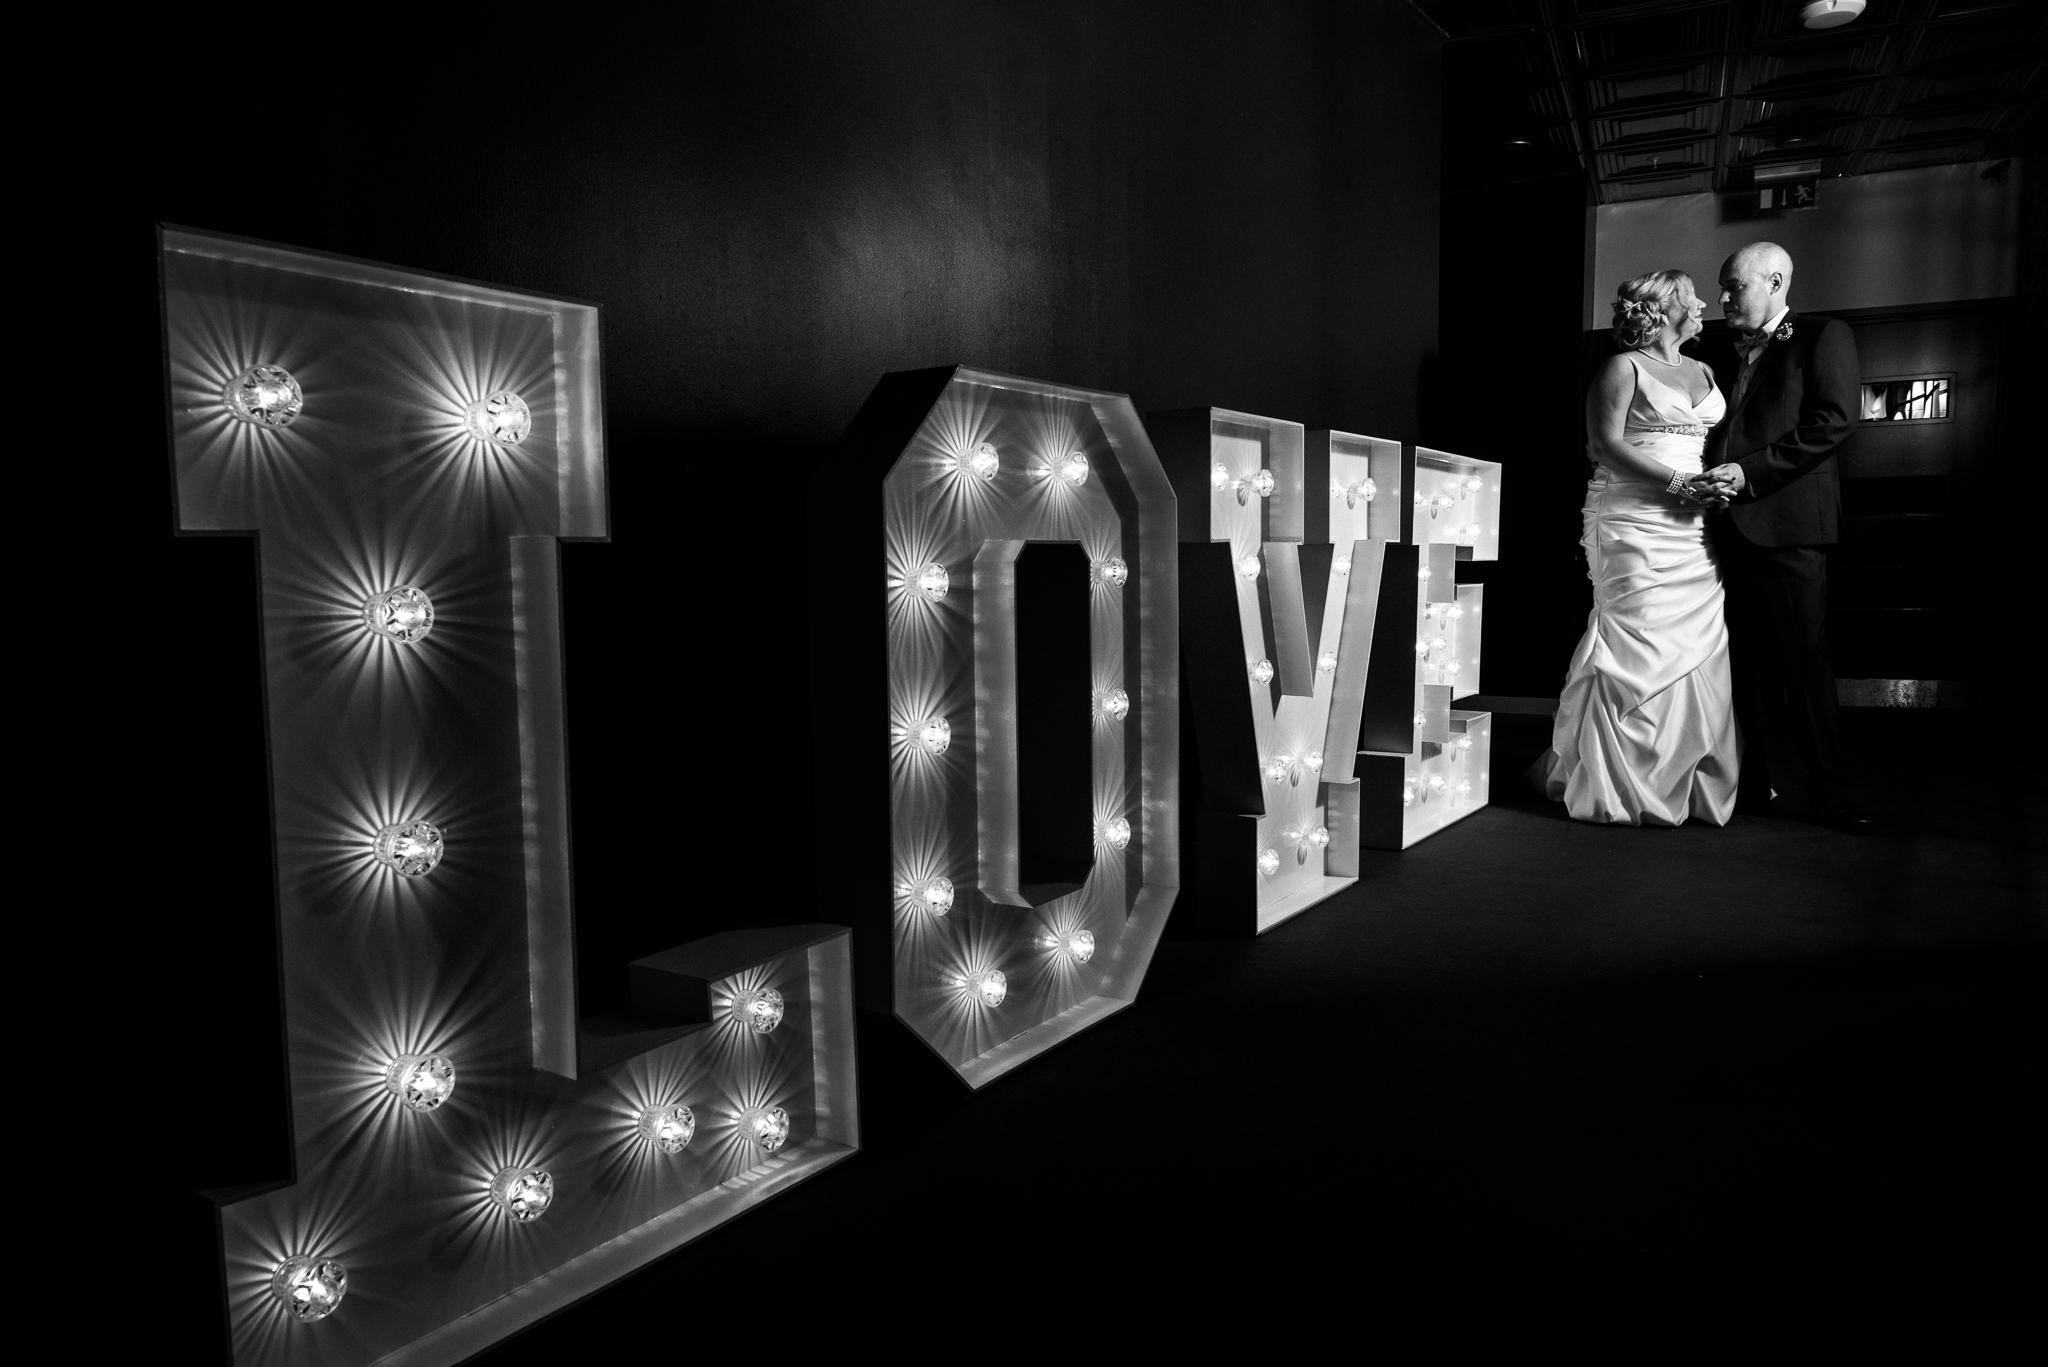 Manchester Wedding Photography On the 7th Media City UK, Salford 20s Art Deco Feathers Urban - Jenny Harper-28.jpg